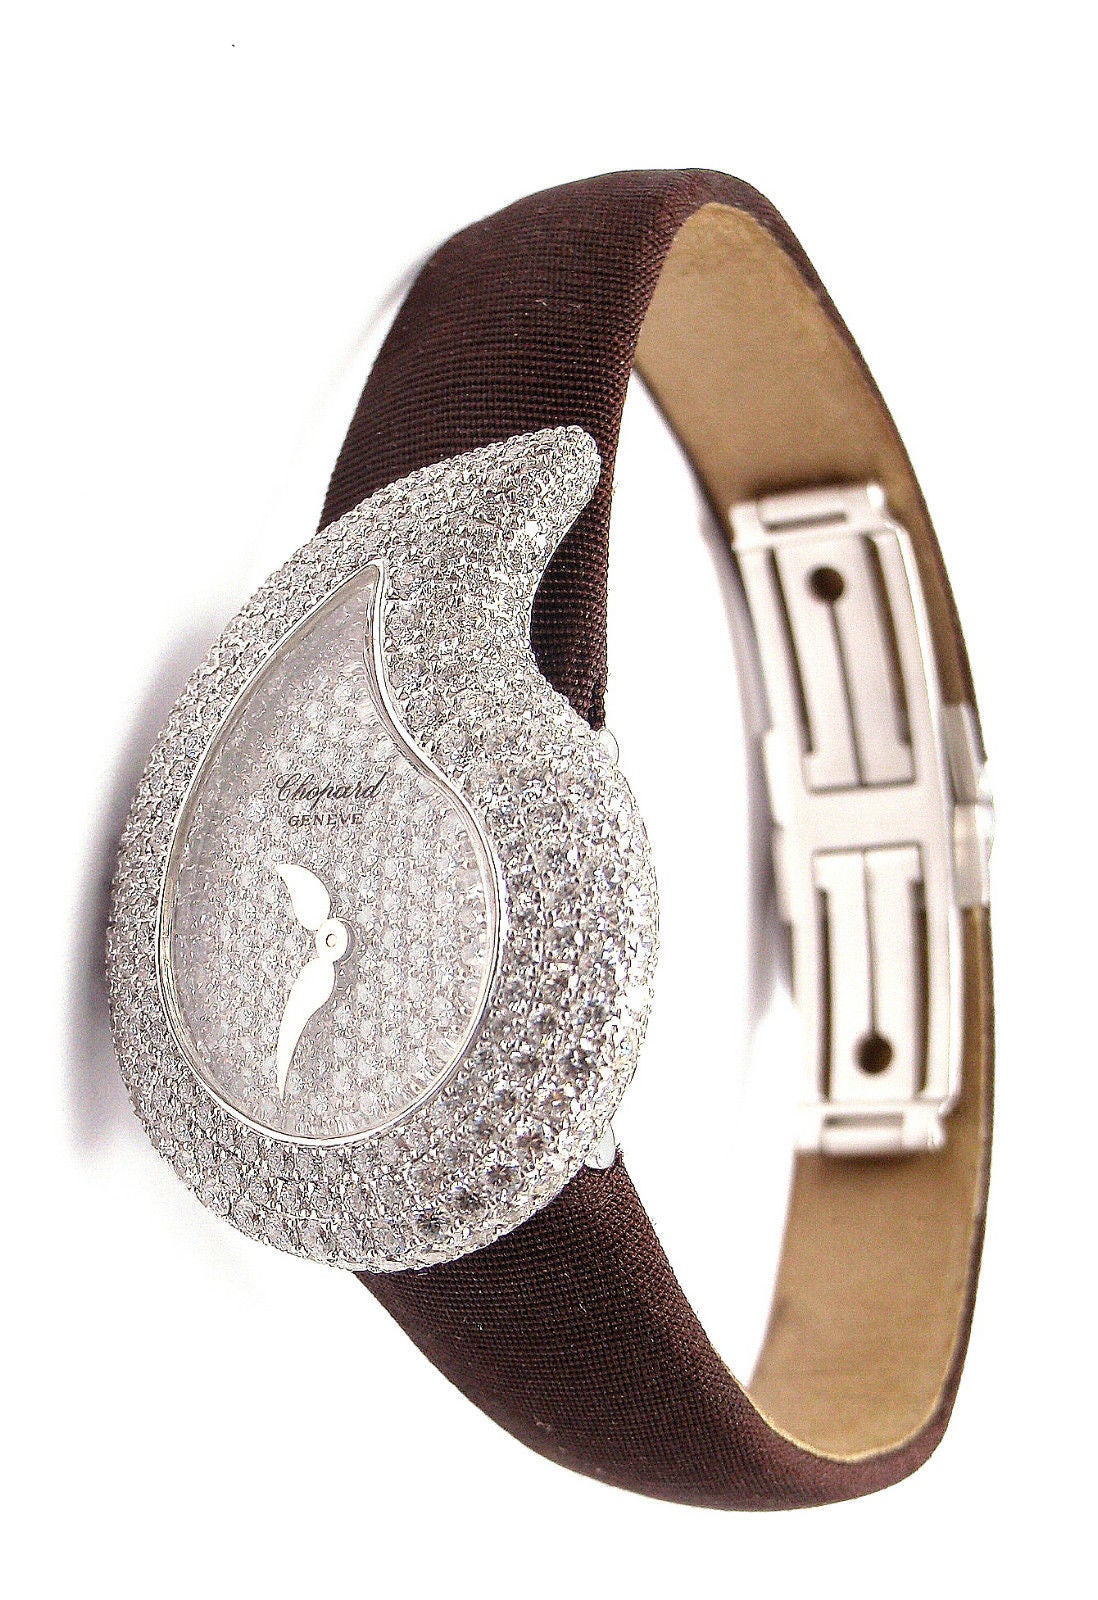 Chopard Lady's White Gold Diamond Pave Casmir Watch 7